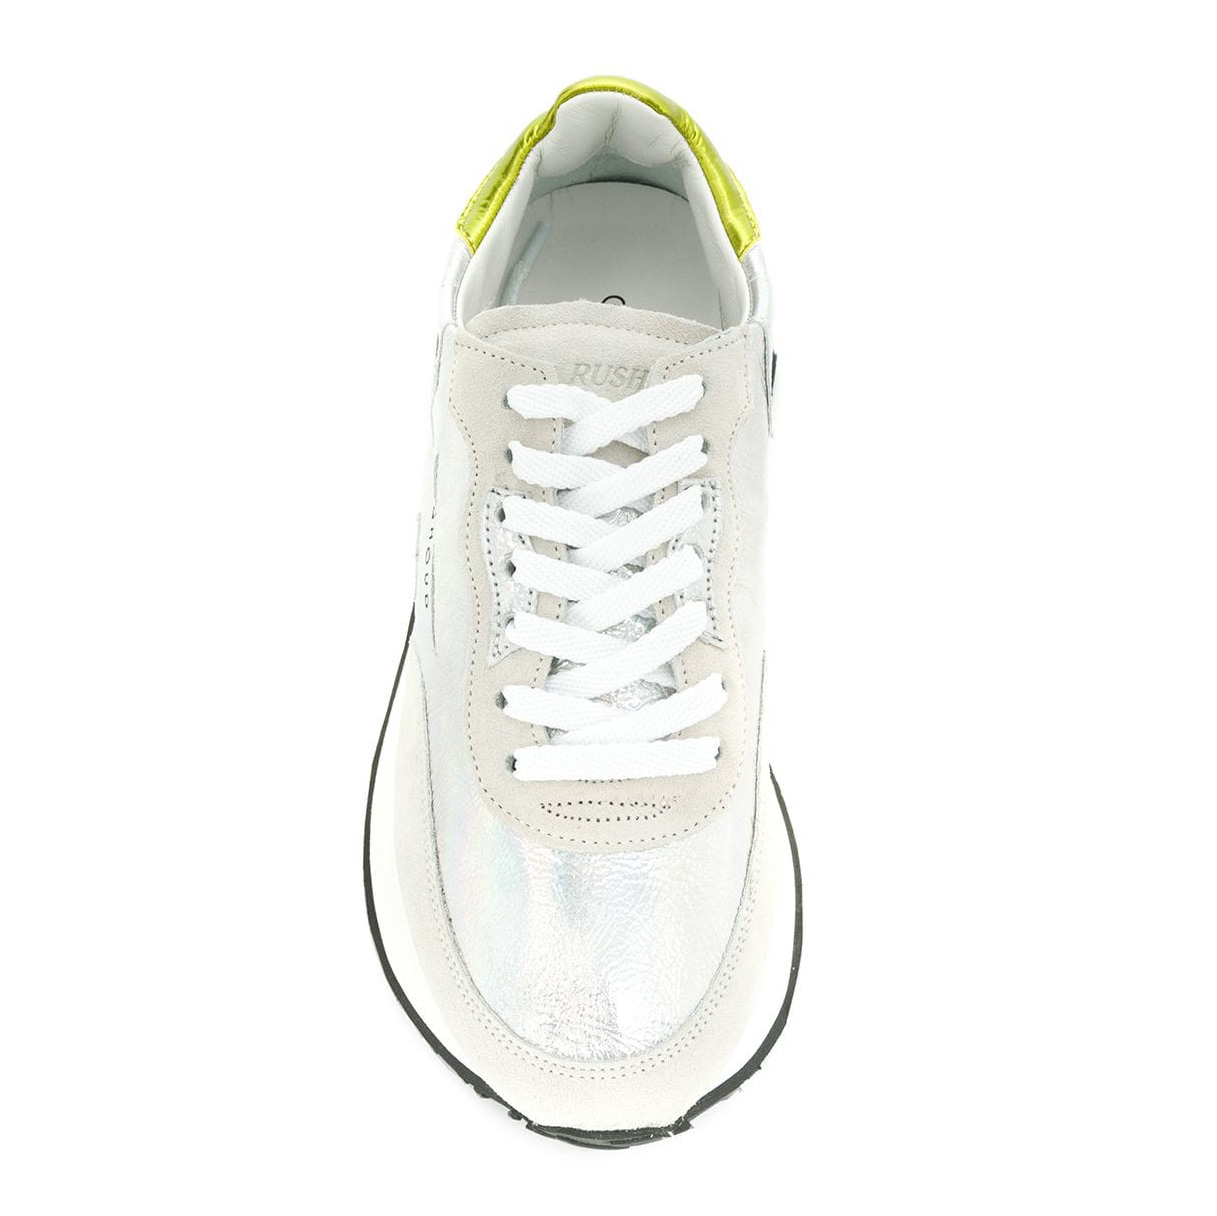 "Ghoud Damen Ledersneaker ""Rush"" Silber 3"